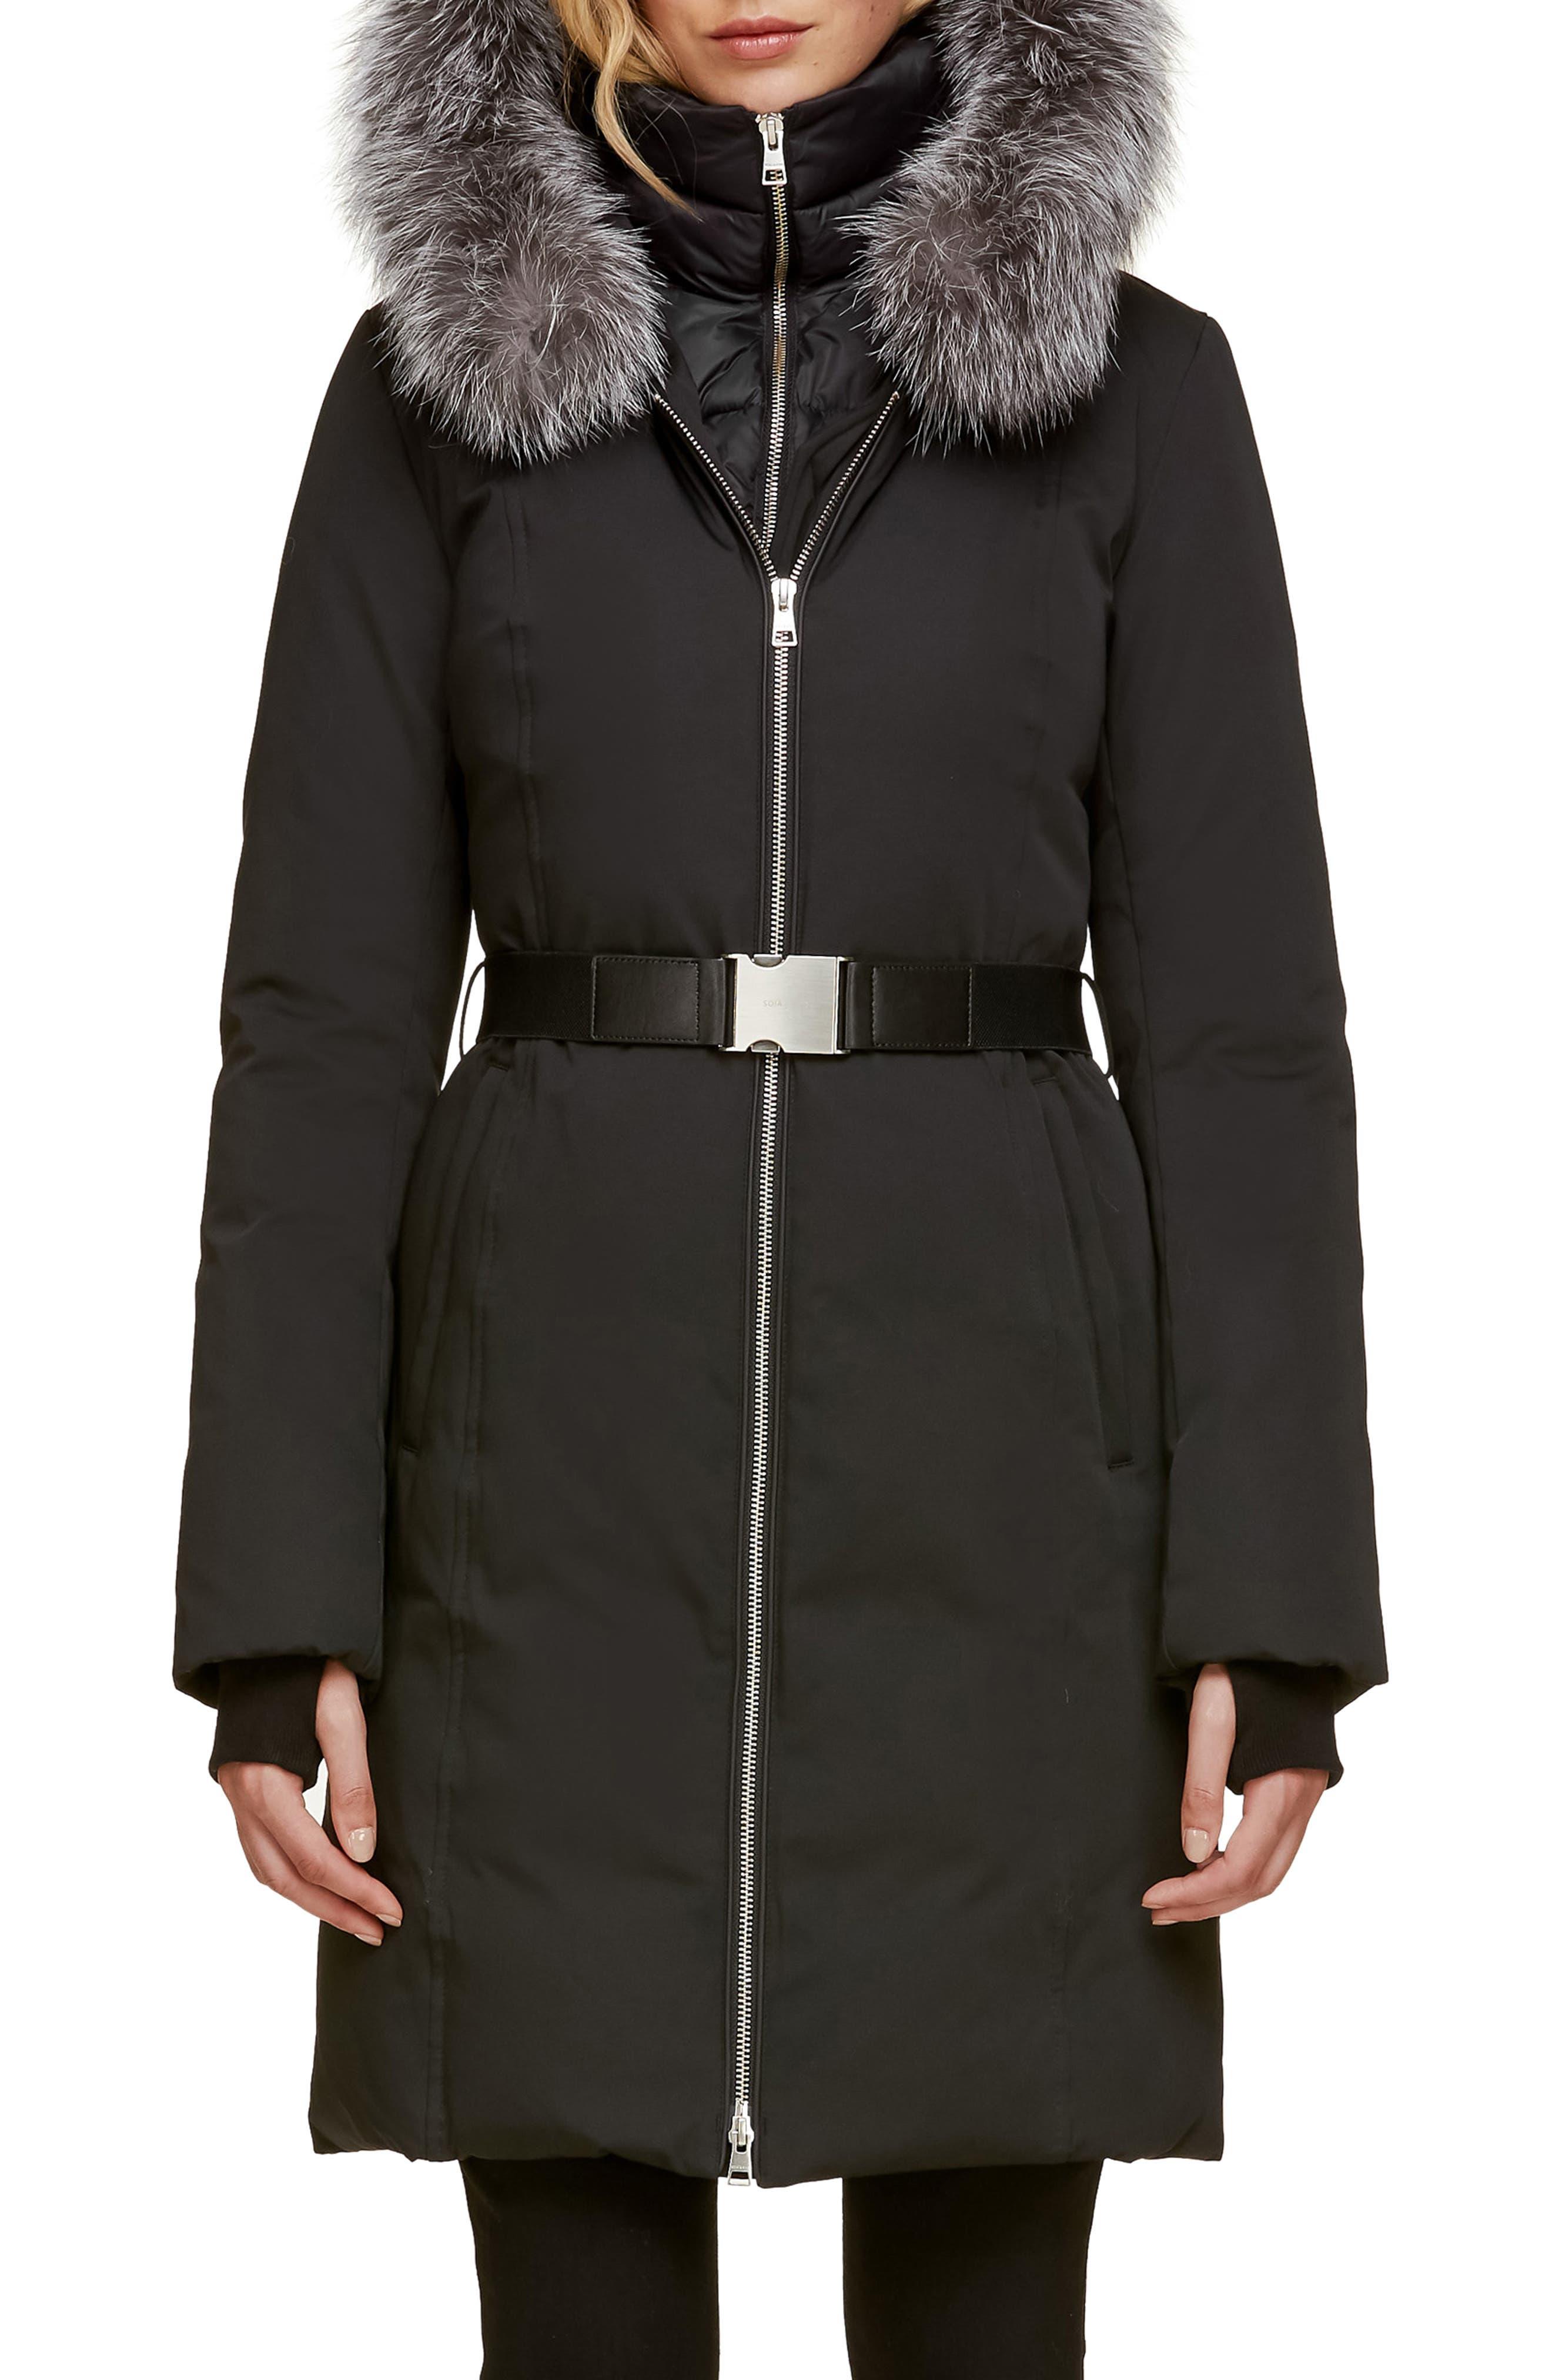 Slim Fit Water Resistant Down Jacket with Genuine Fox Fur Trim, Main, color, BLACK